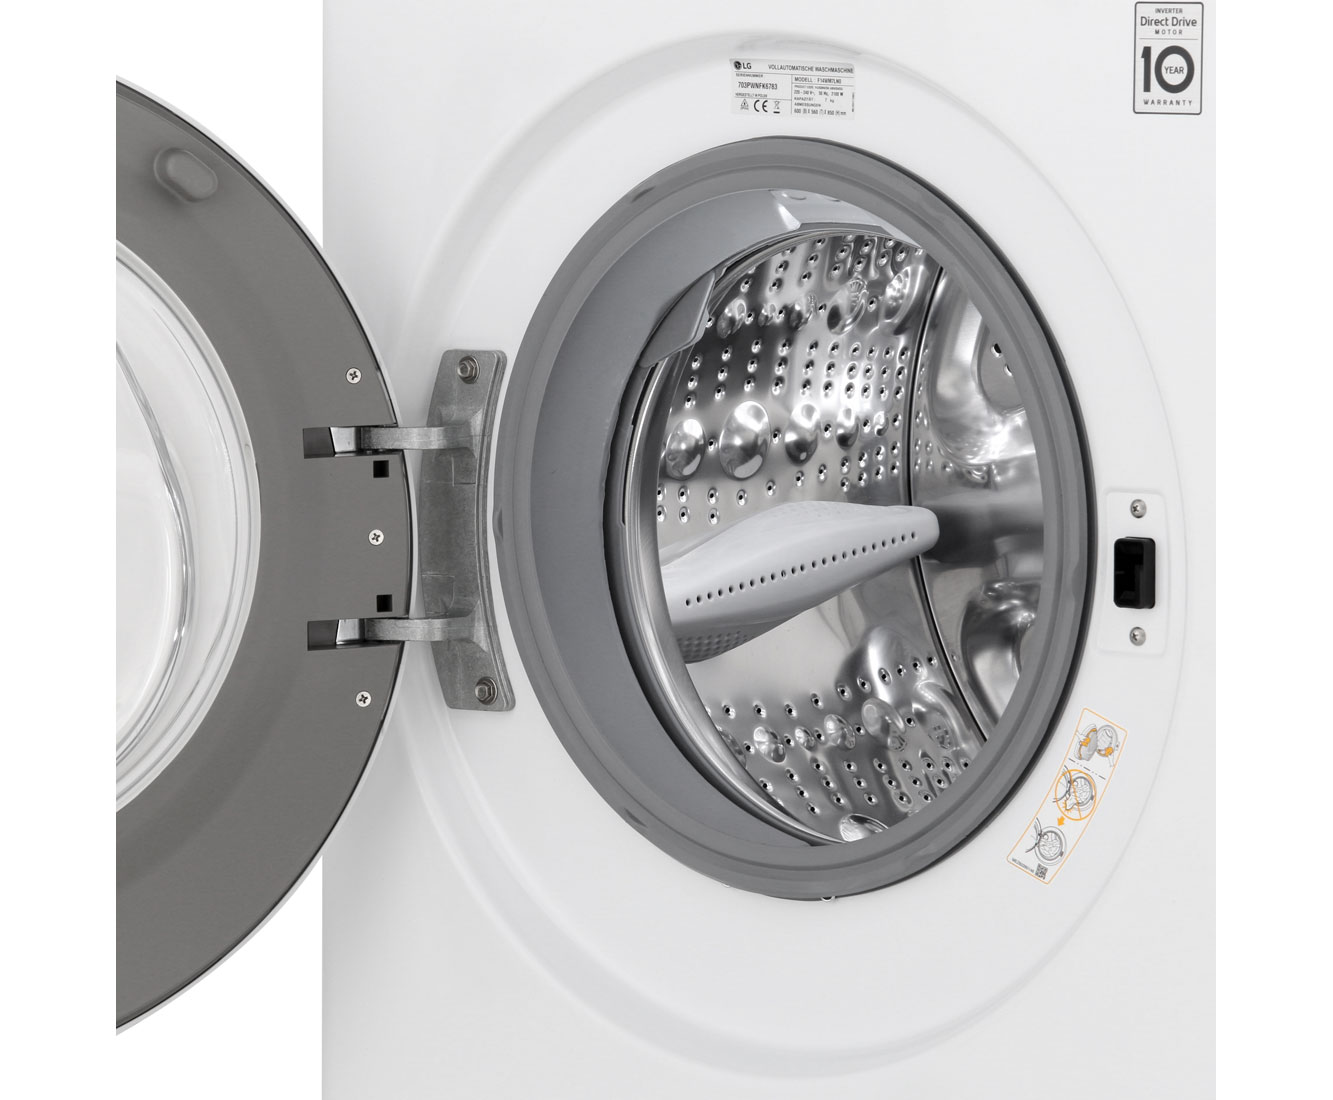 lg f 14wm 7ln0 waschmaschine freistehend wei 223 neu ebay